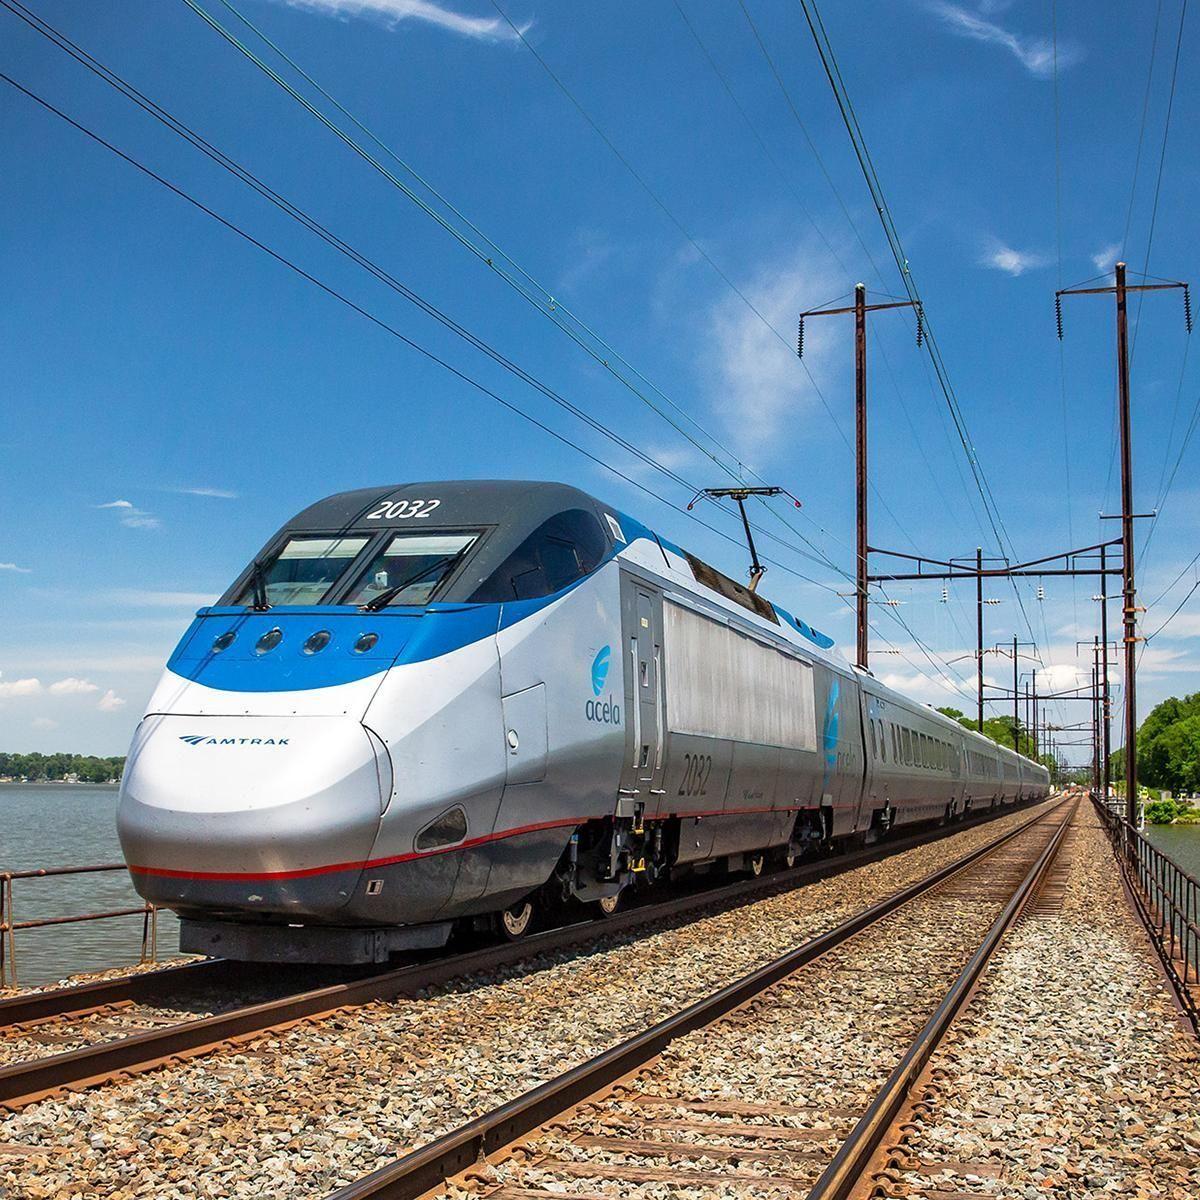 Amtrak Buy One Get One Free Ticket V540 #amtrak #train